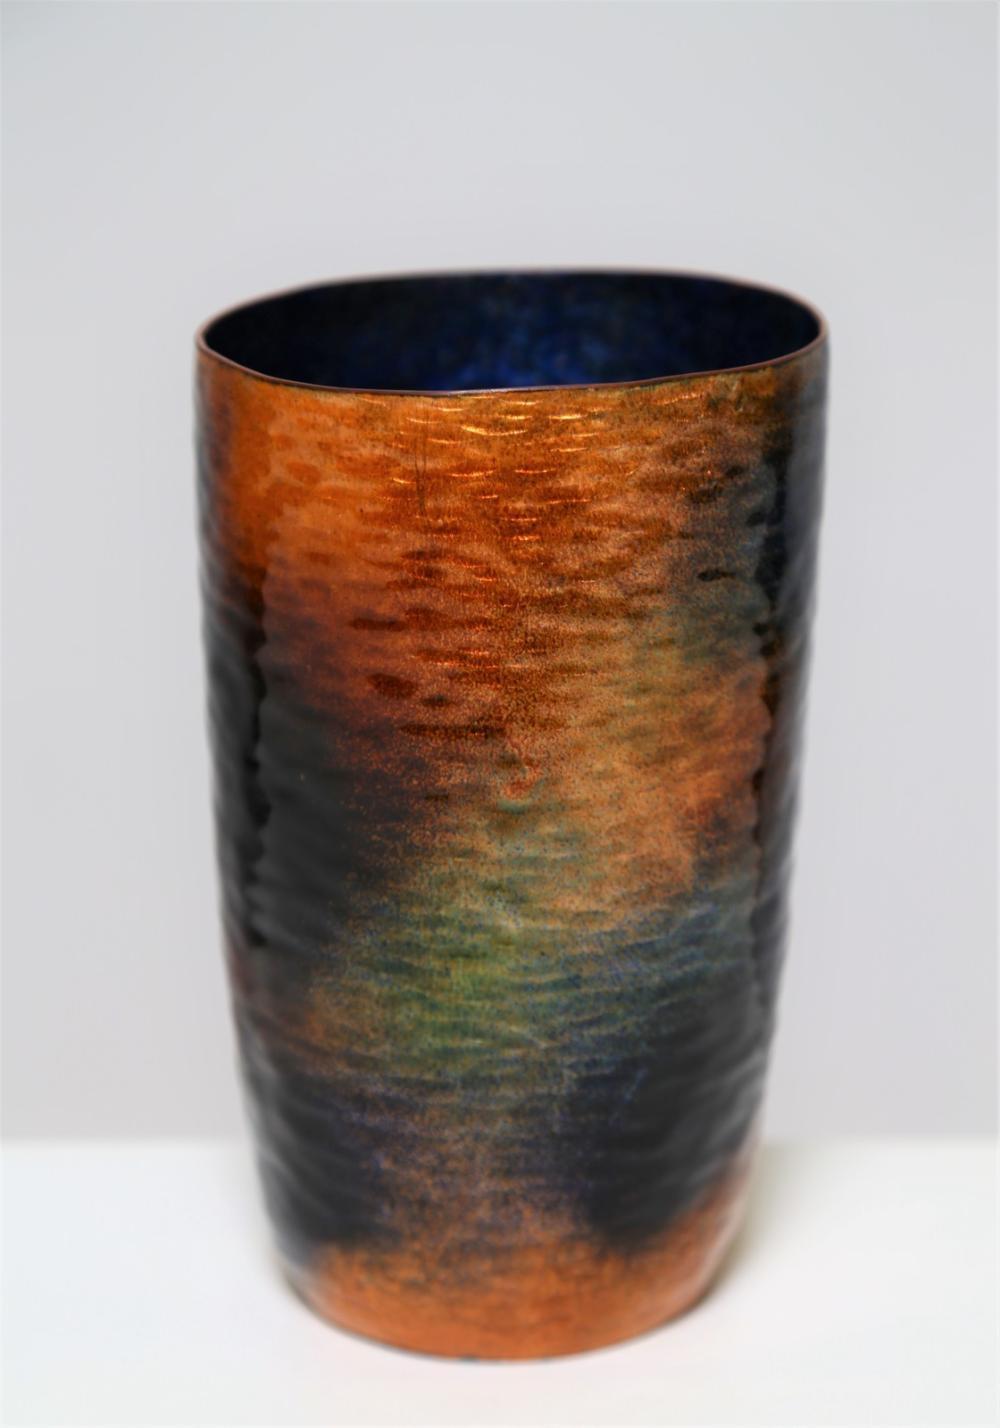 DE POLI PAOLO (1905 - 1996) Vase